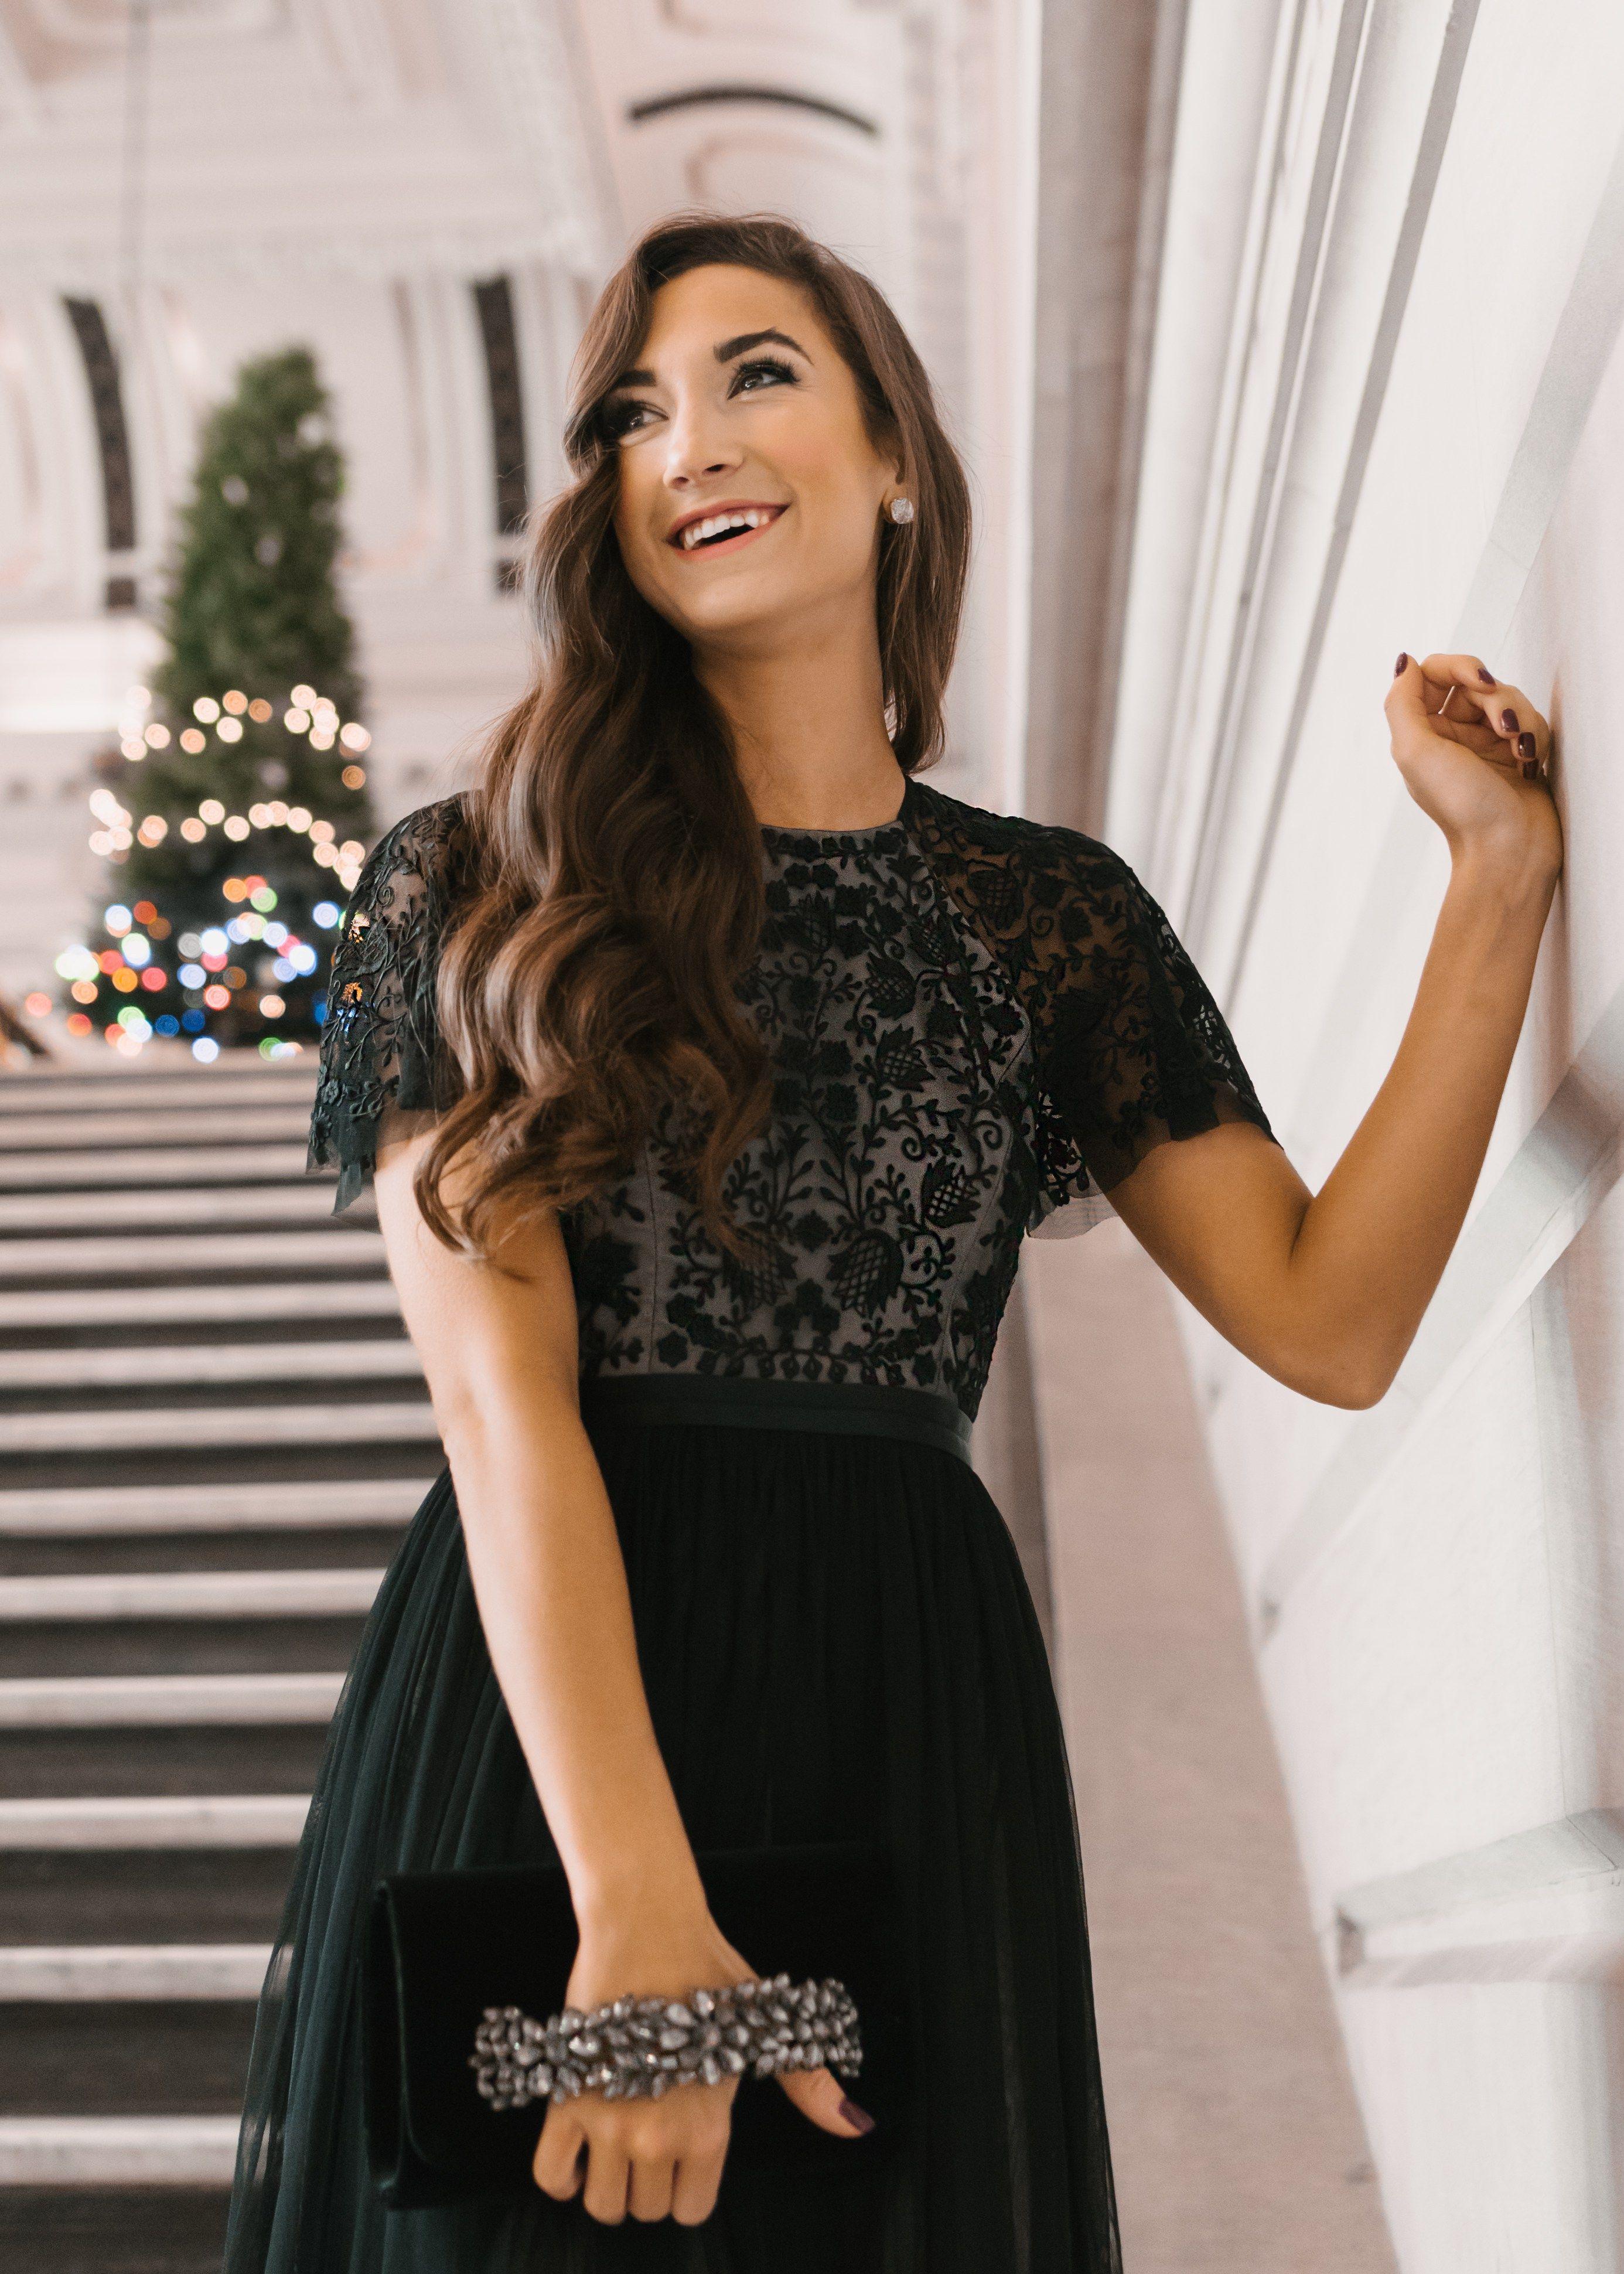 What to wear to a black tie wedding black tie wedding black tie